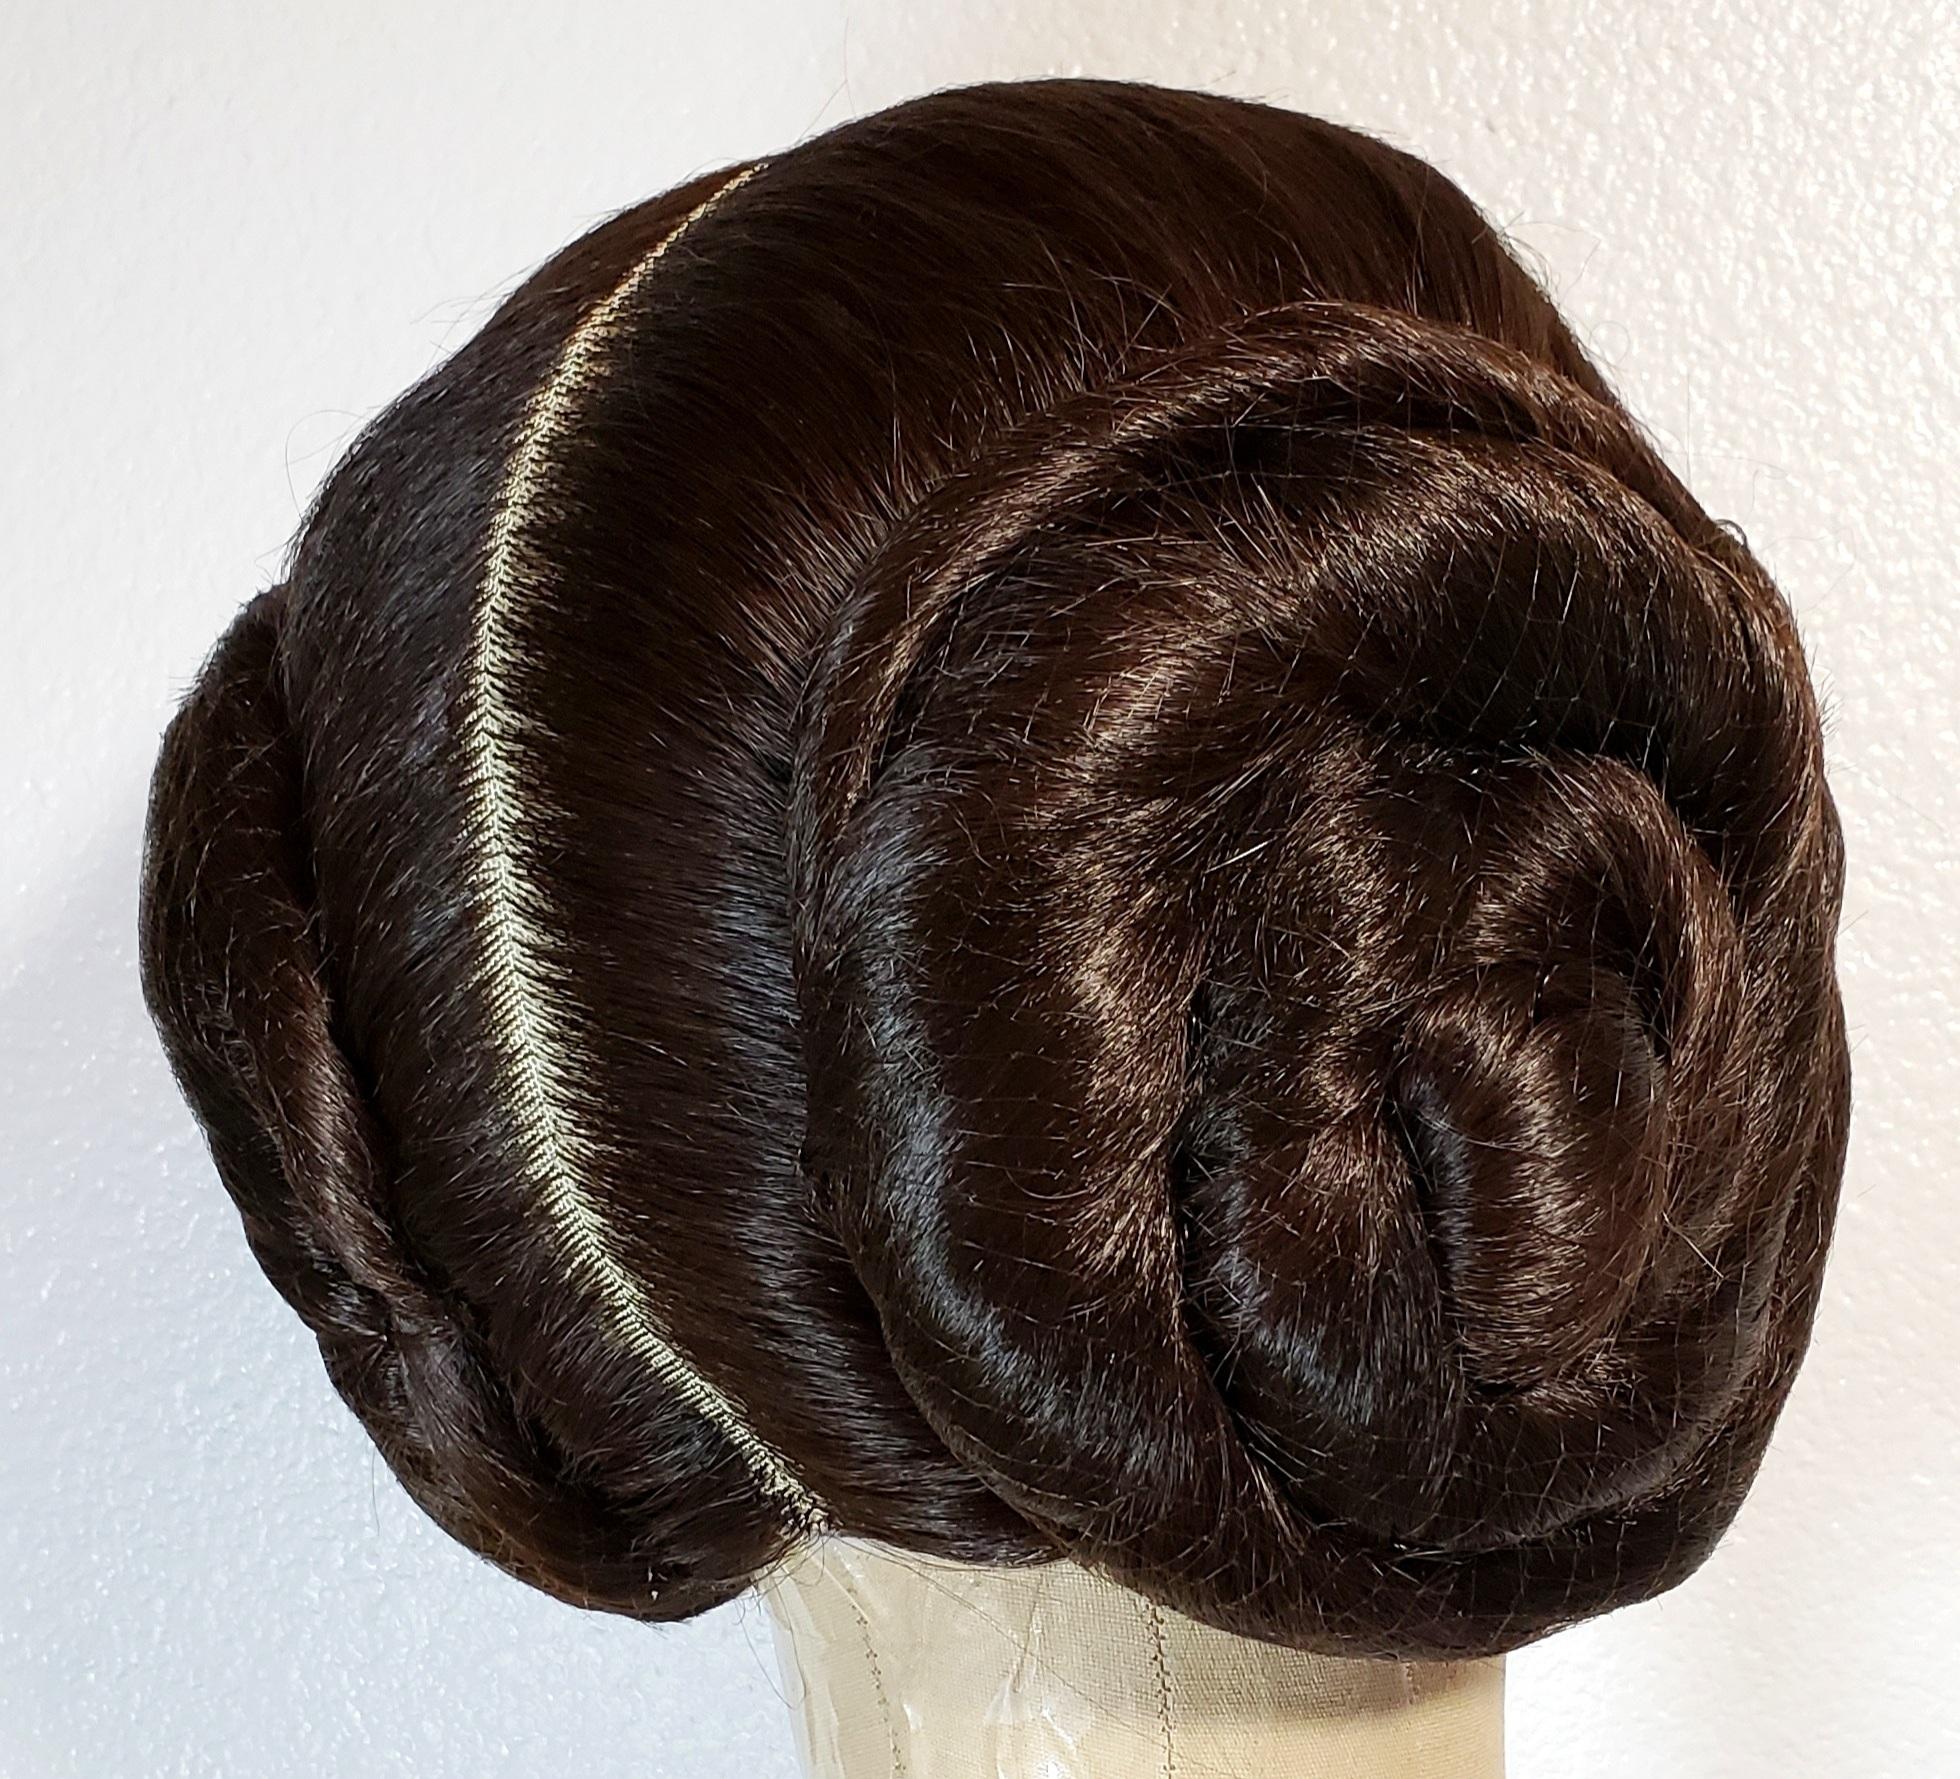 Princess Leia A New Hope Inspired Wig